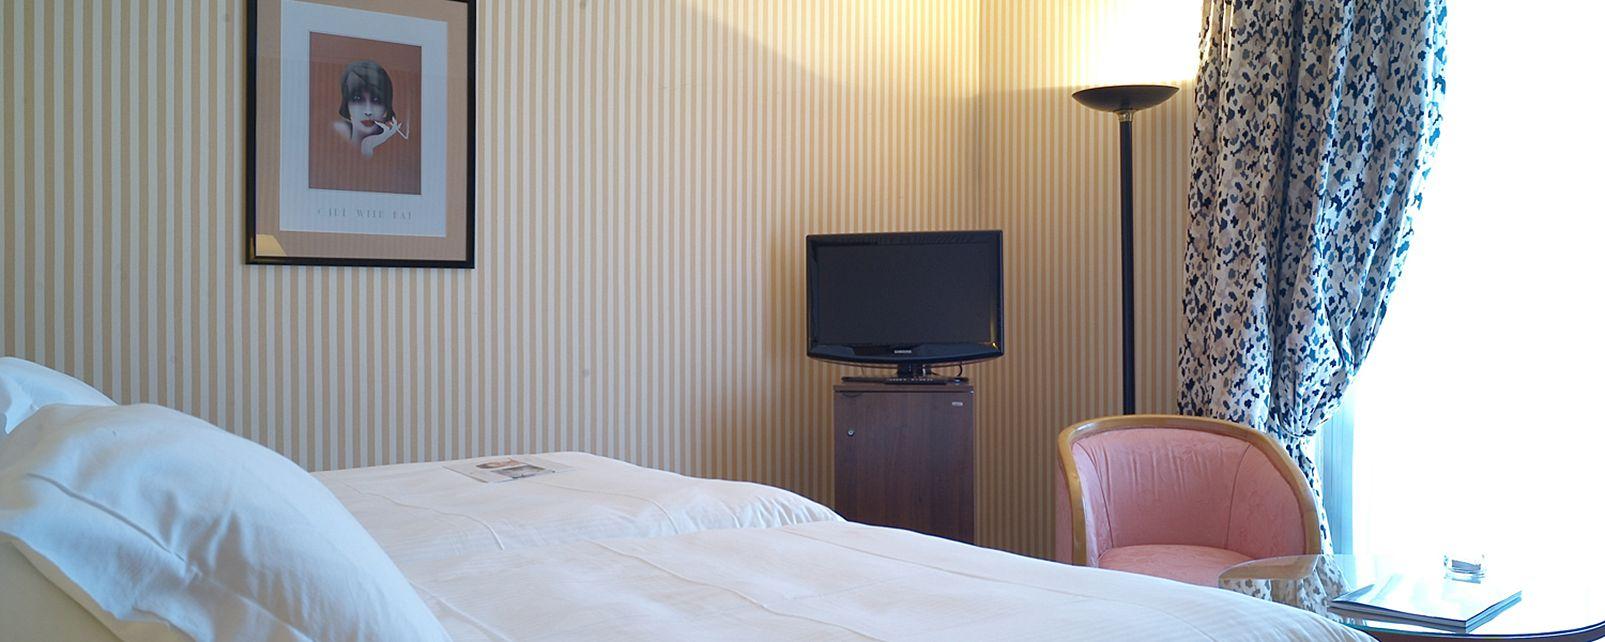 Hotel Grand Hyatt Cannes Hôtel Martinez